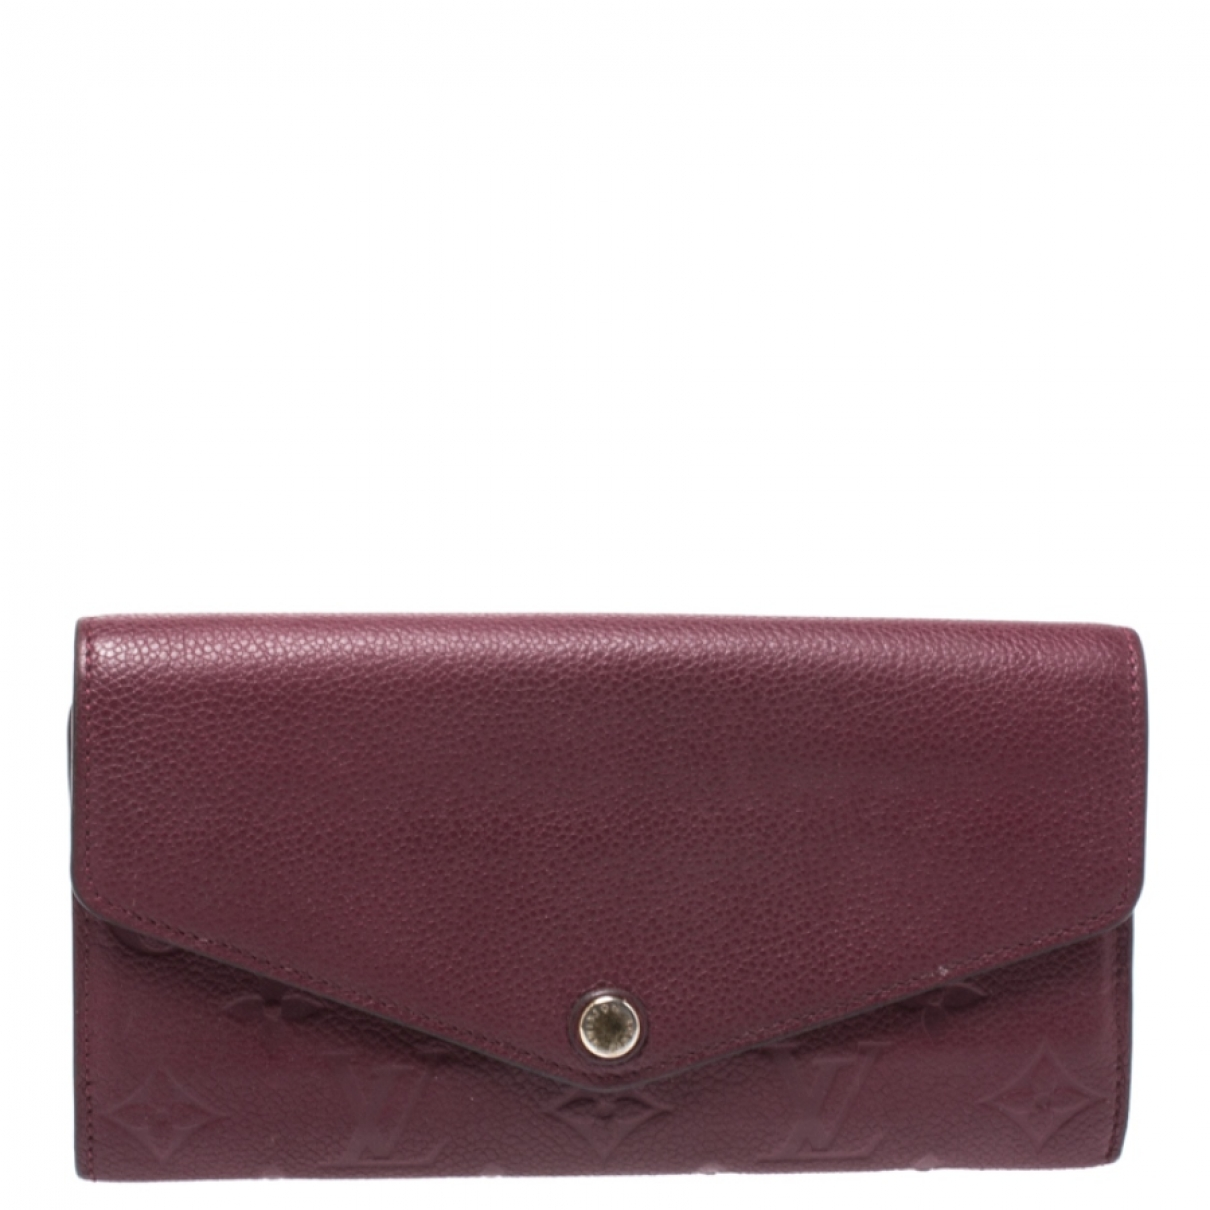 Louis Vuitton \N Burgundy Leather wallet for Women \N